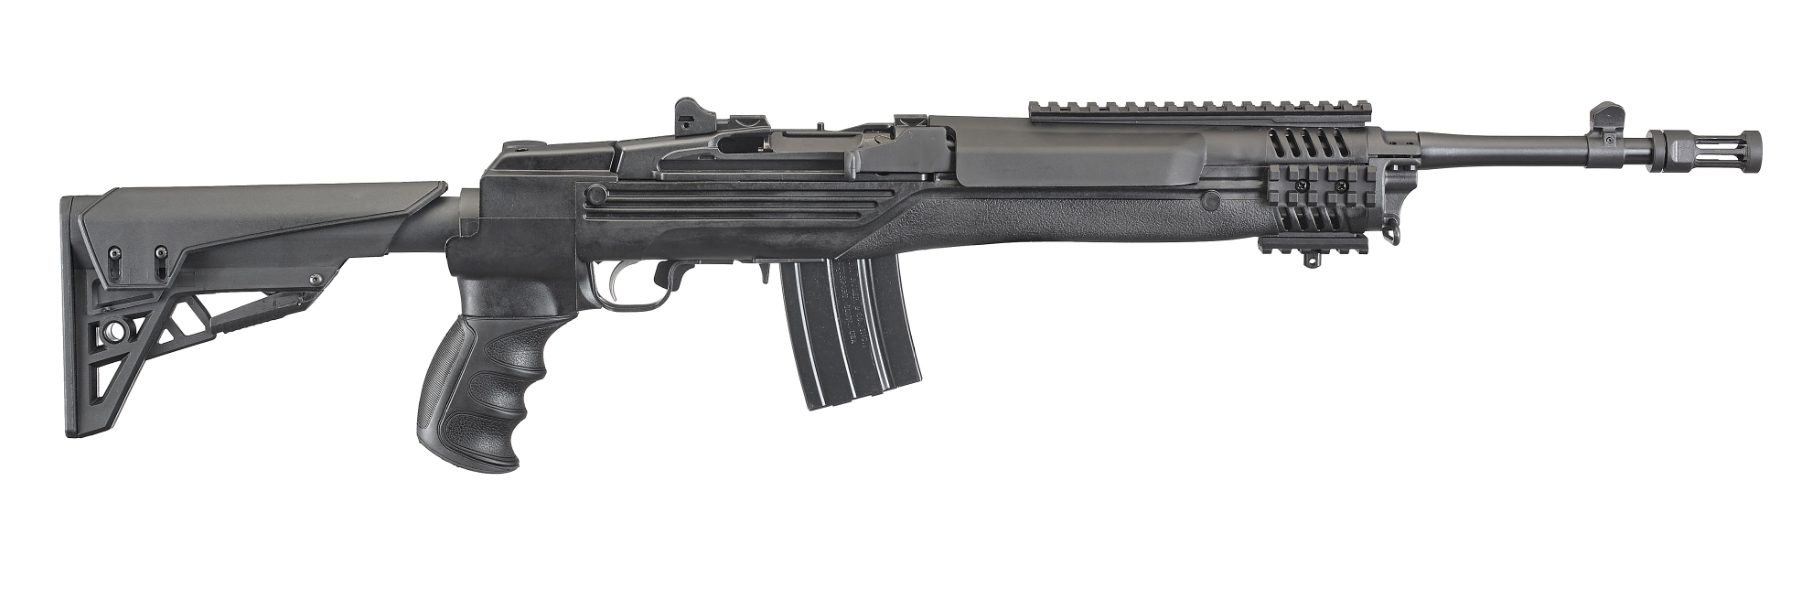 Ruger MINI-14 TACTICAL 223 REM   5.56 NATO